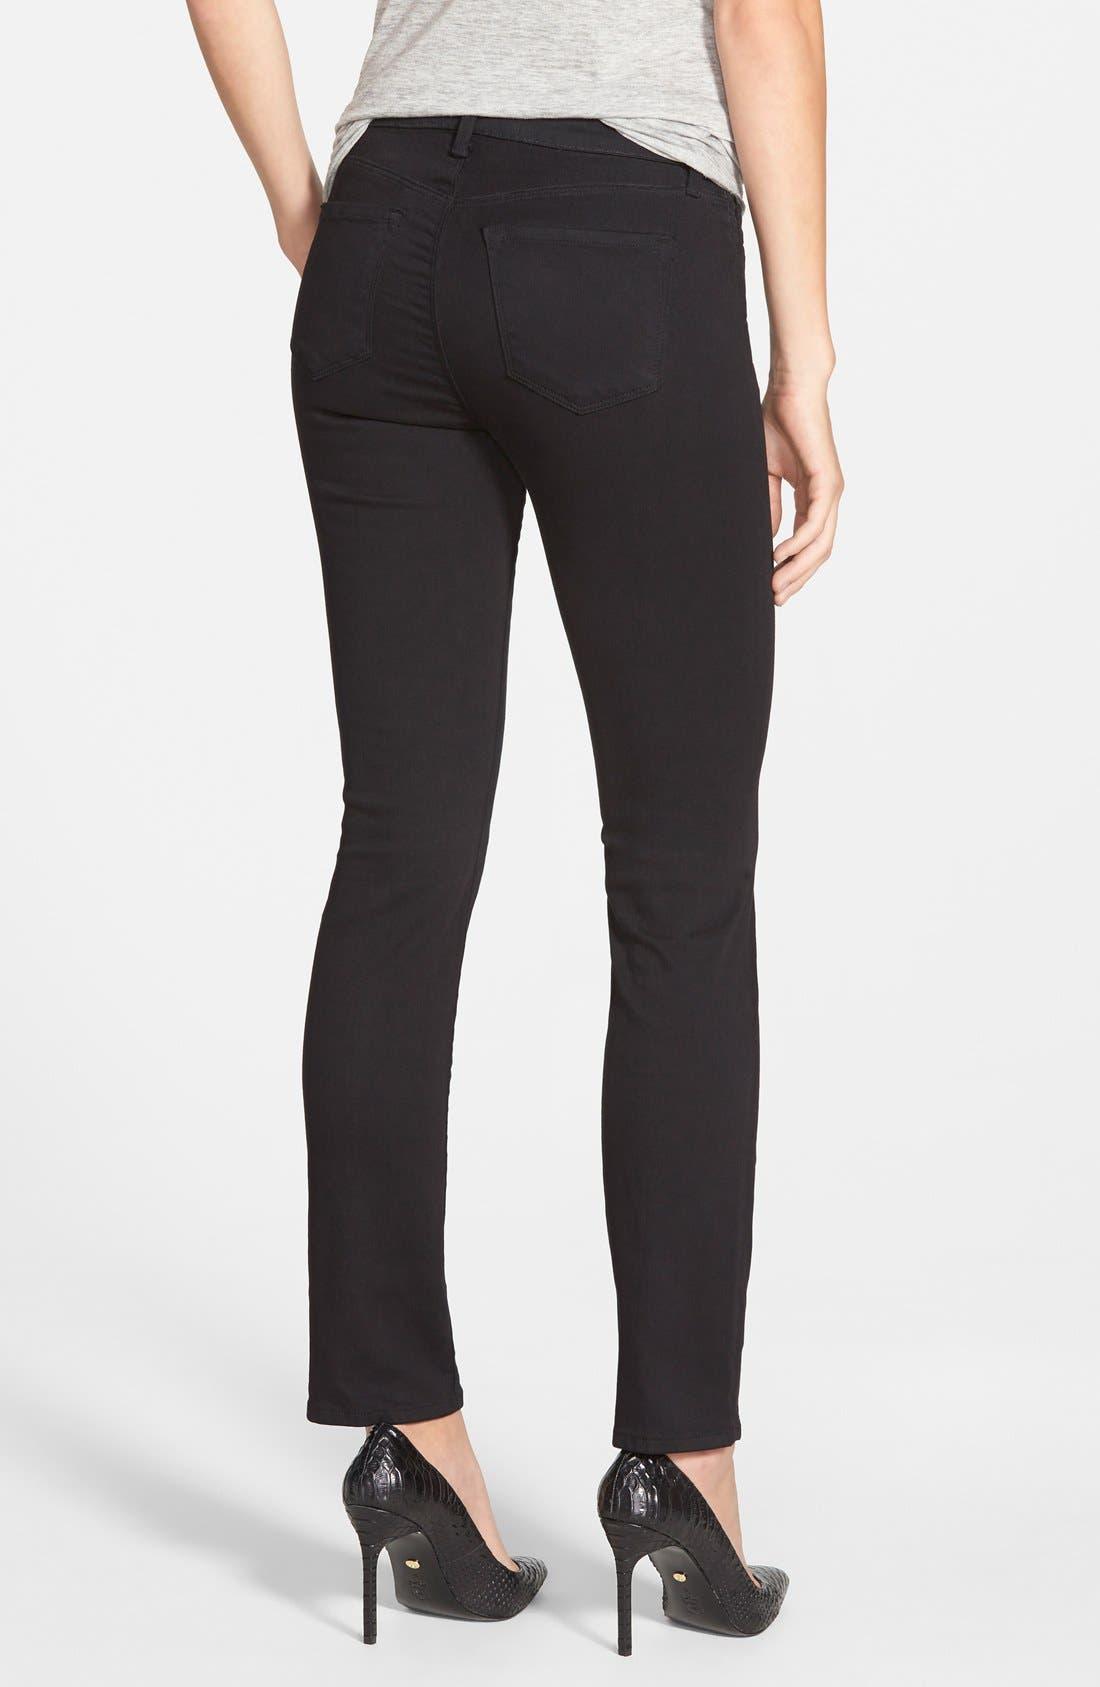 Alternate Image 2  - J Brand '811' Mid Rise Skinny Jeans (Black) (Nordstrom Exclusive)